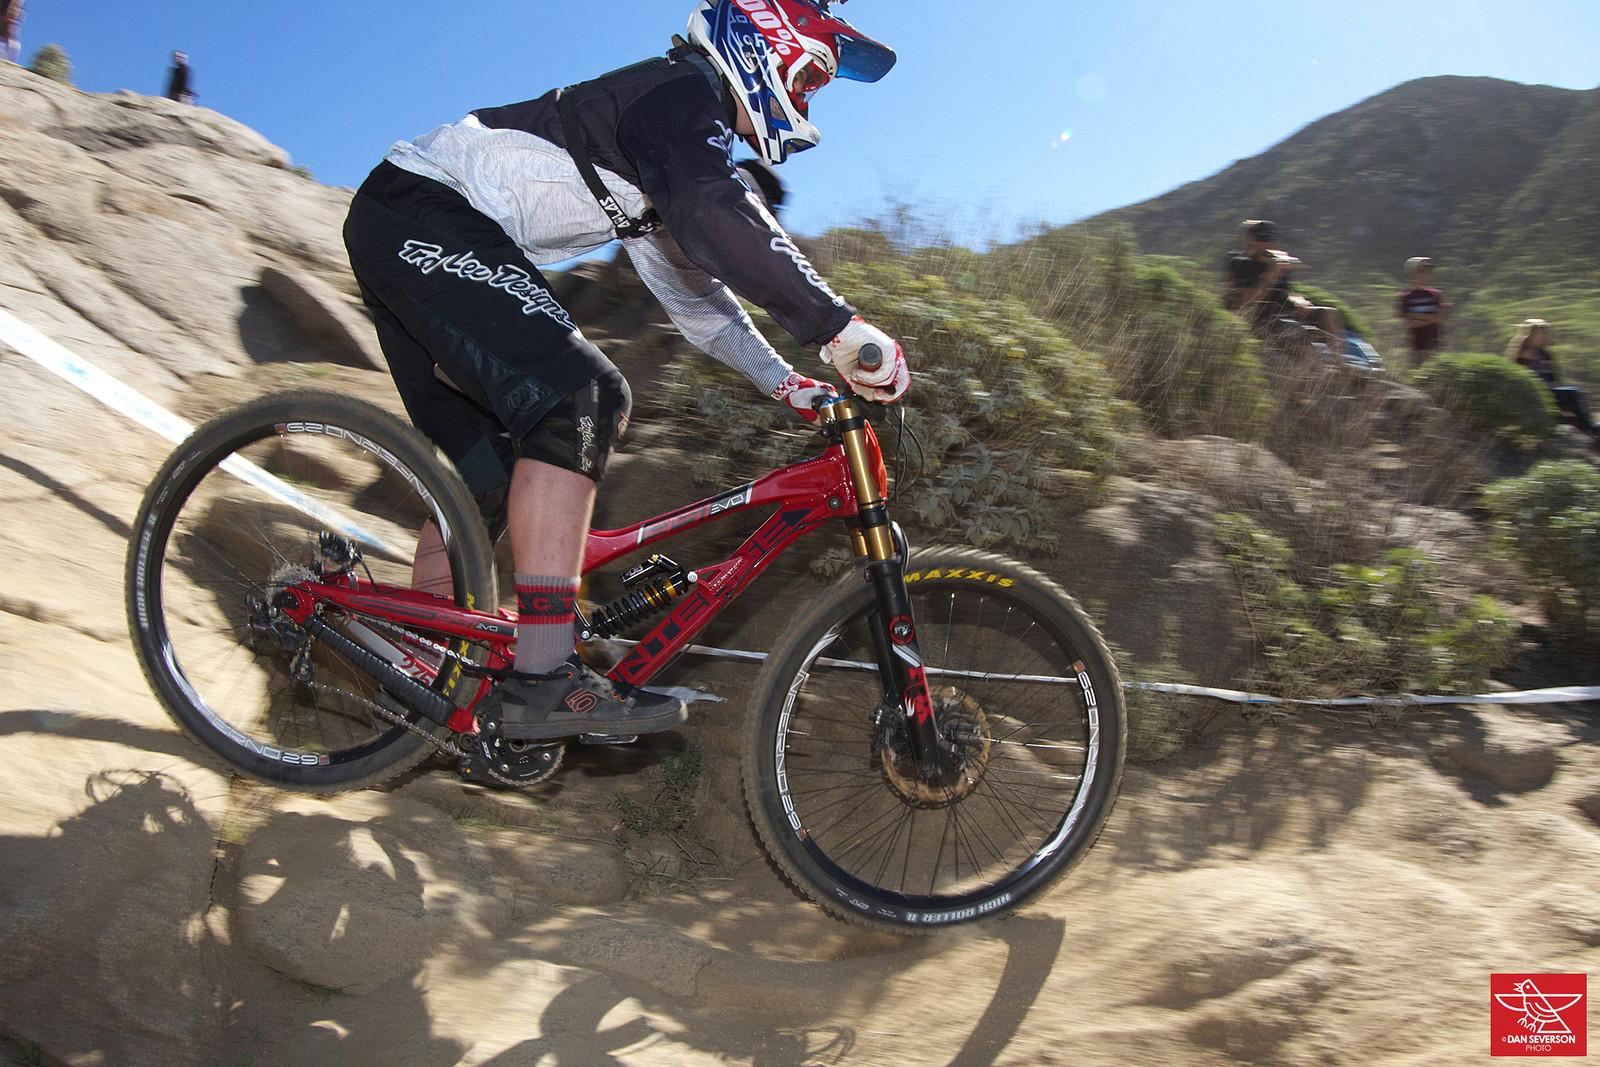 G-Out Project: Fontana 2015 - Intense 951 - danseverson photo - Mountain Biking Pictures - Vital MTB